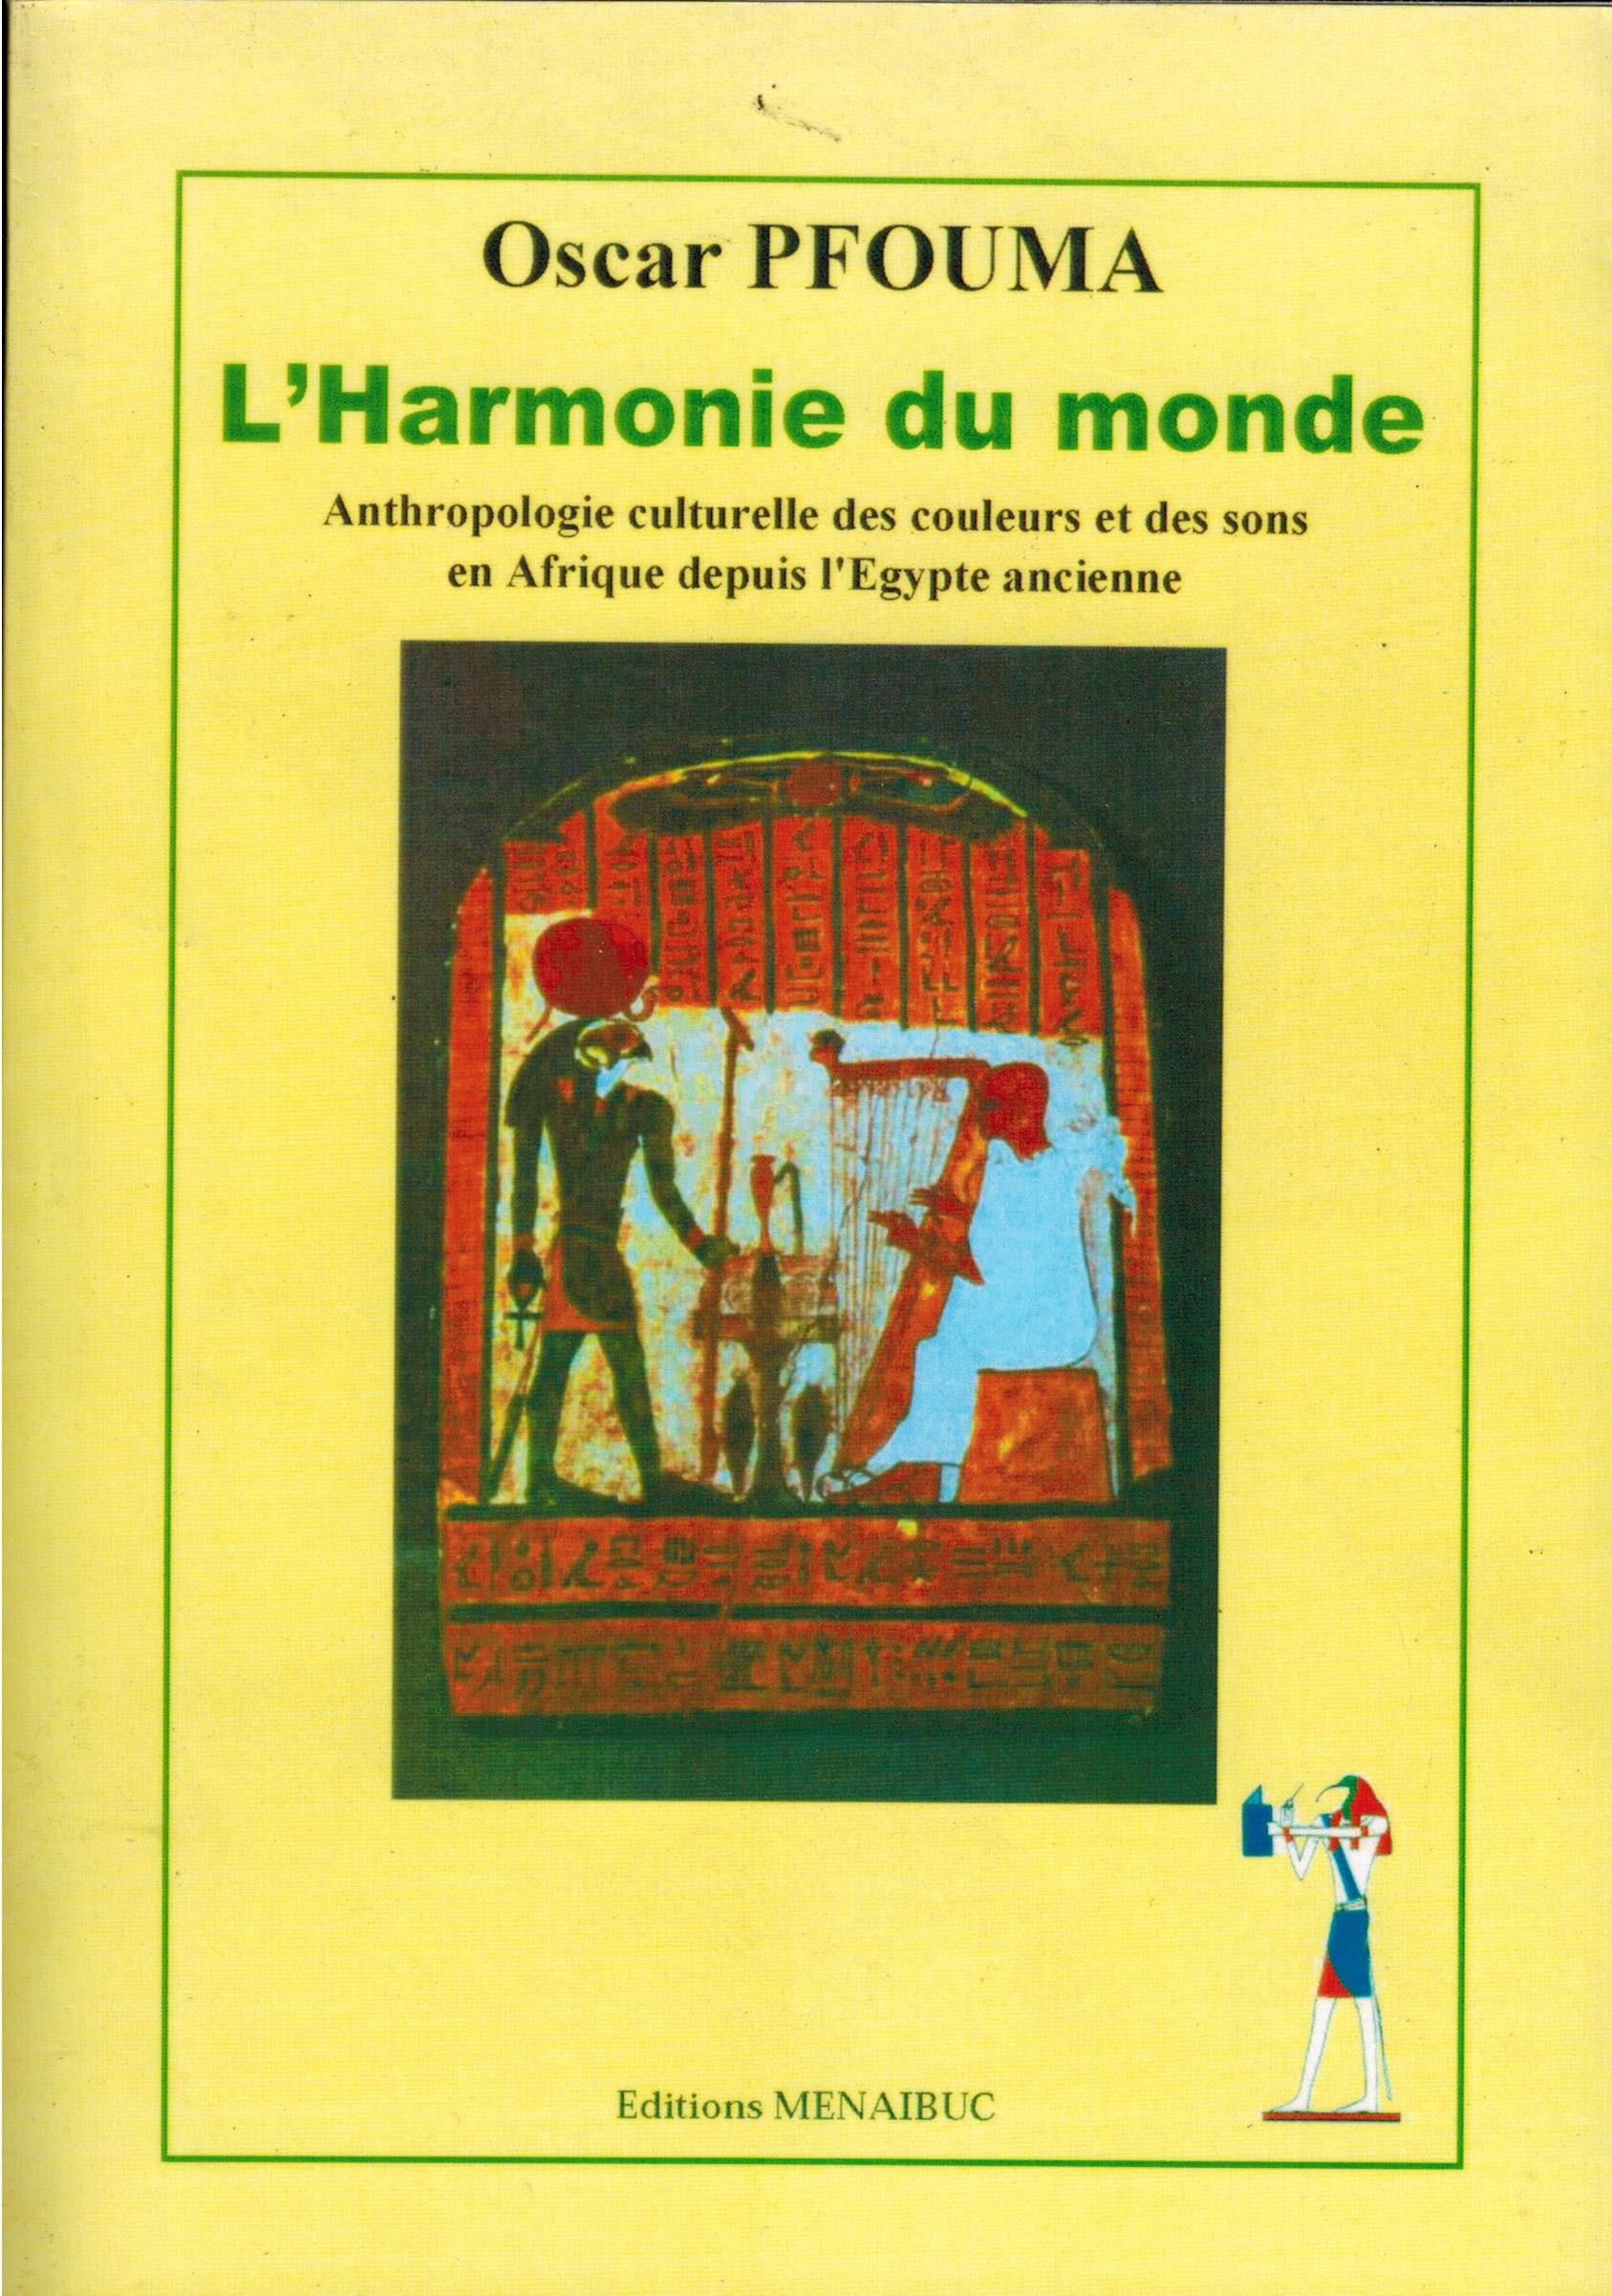 L'HARMONIE DU MONDE